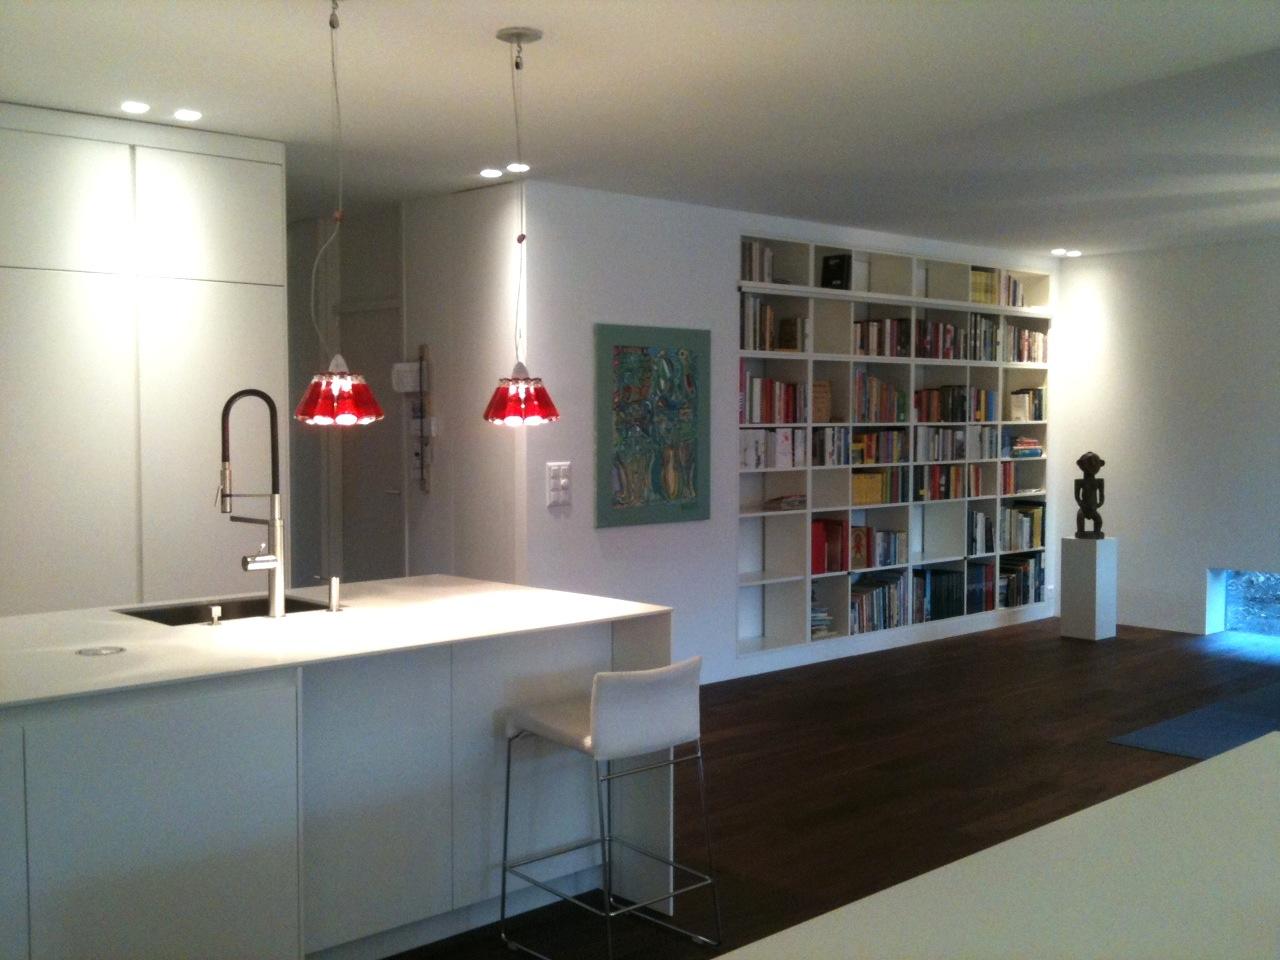 Kitchen Counter Lighting Green Decor Ingo Maurer Campari Light Pendantlamp, Red Glas Size 1 ...